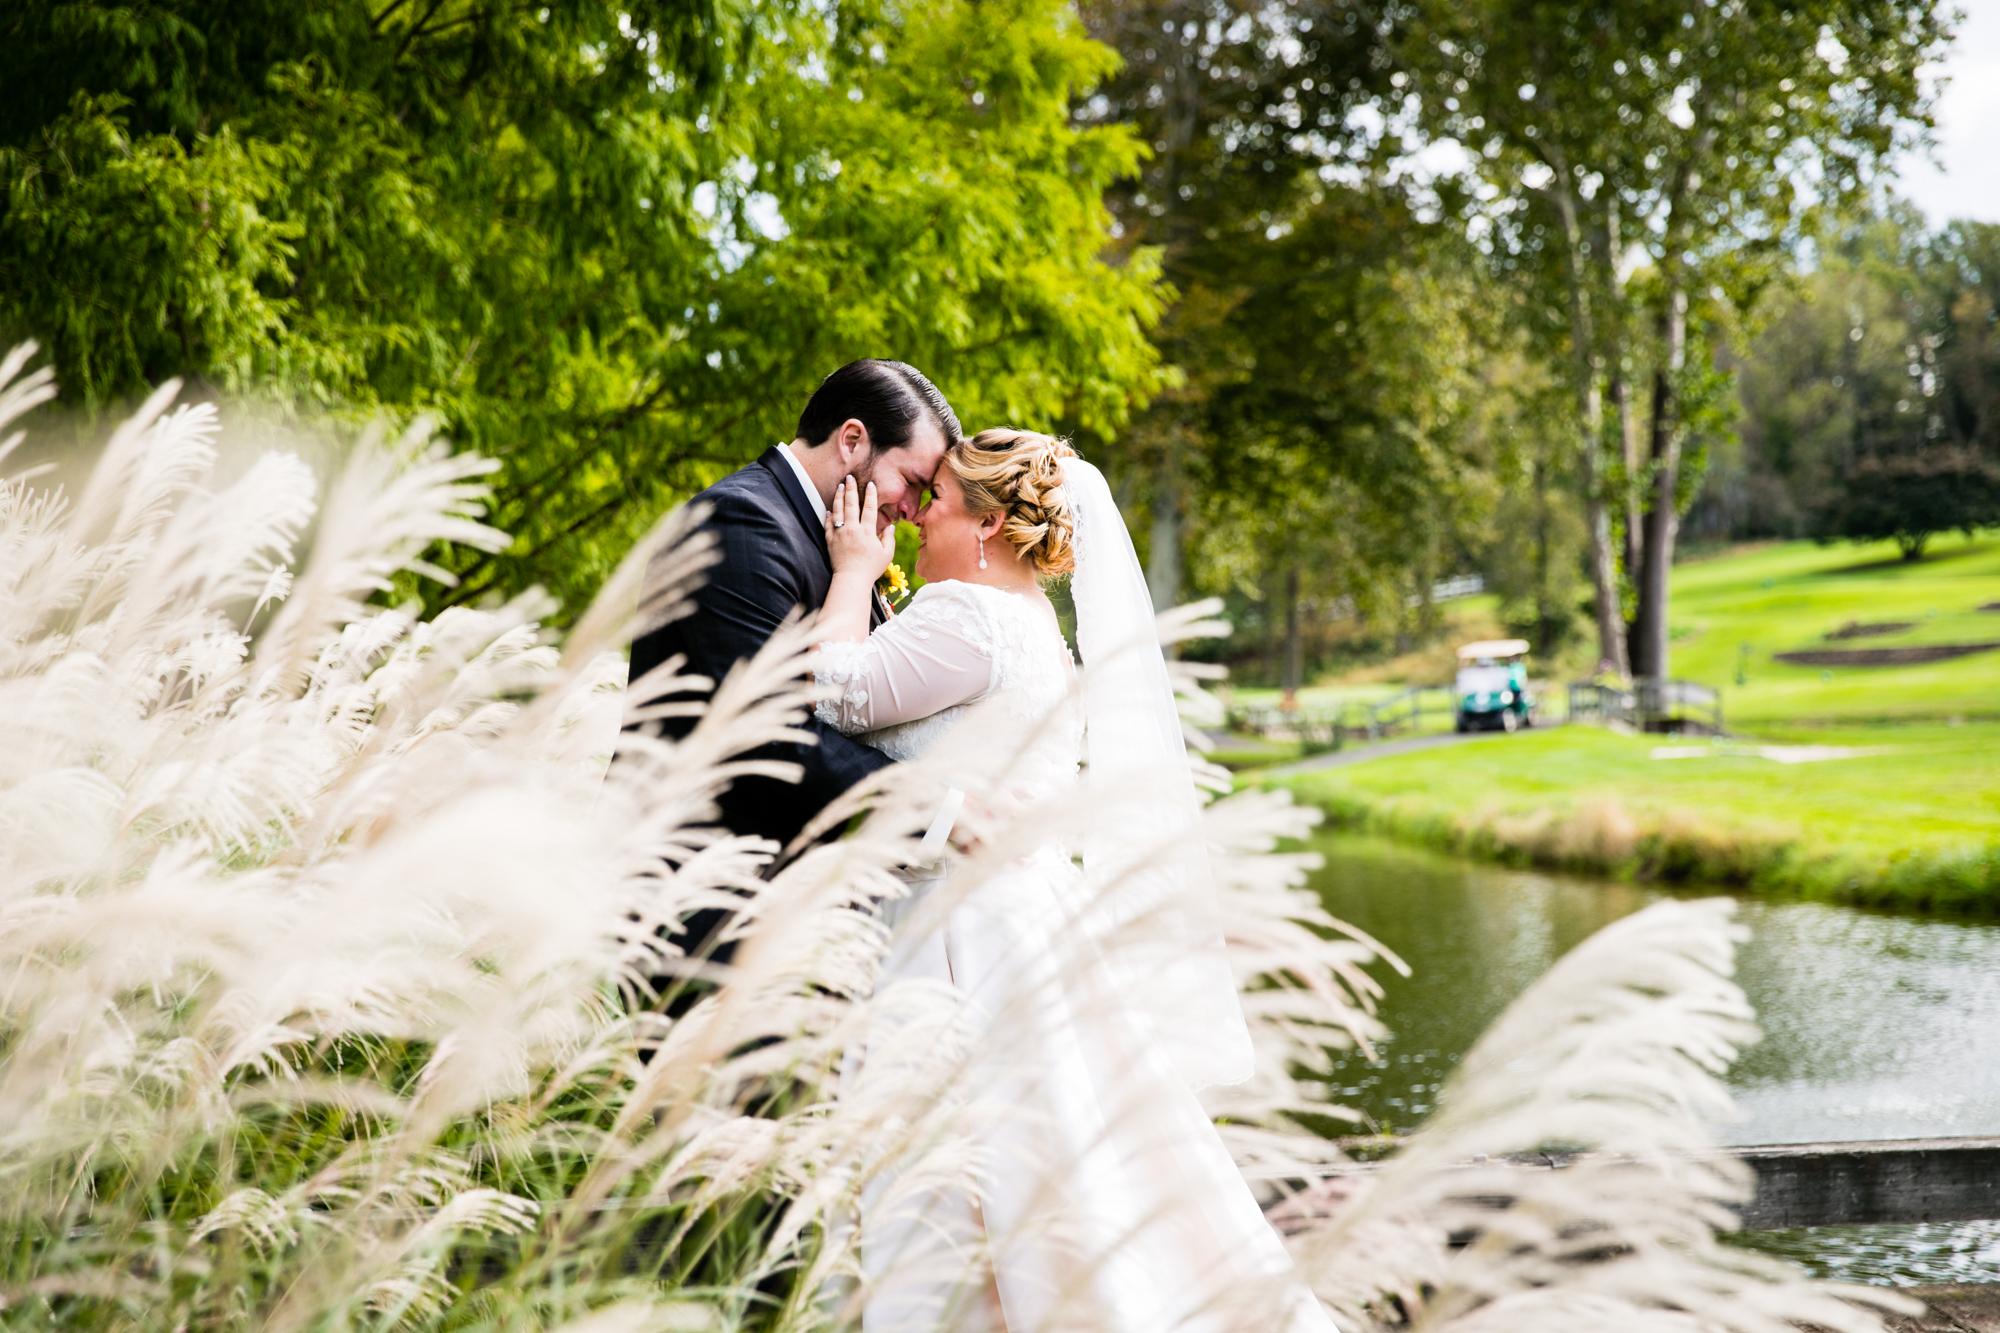 Cedar Brook Country Club Wedding Photography - Lovestruck Pictures-028.jpg